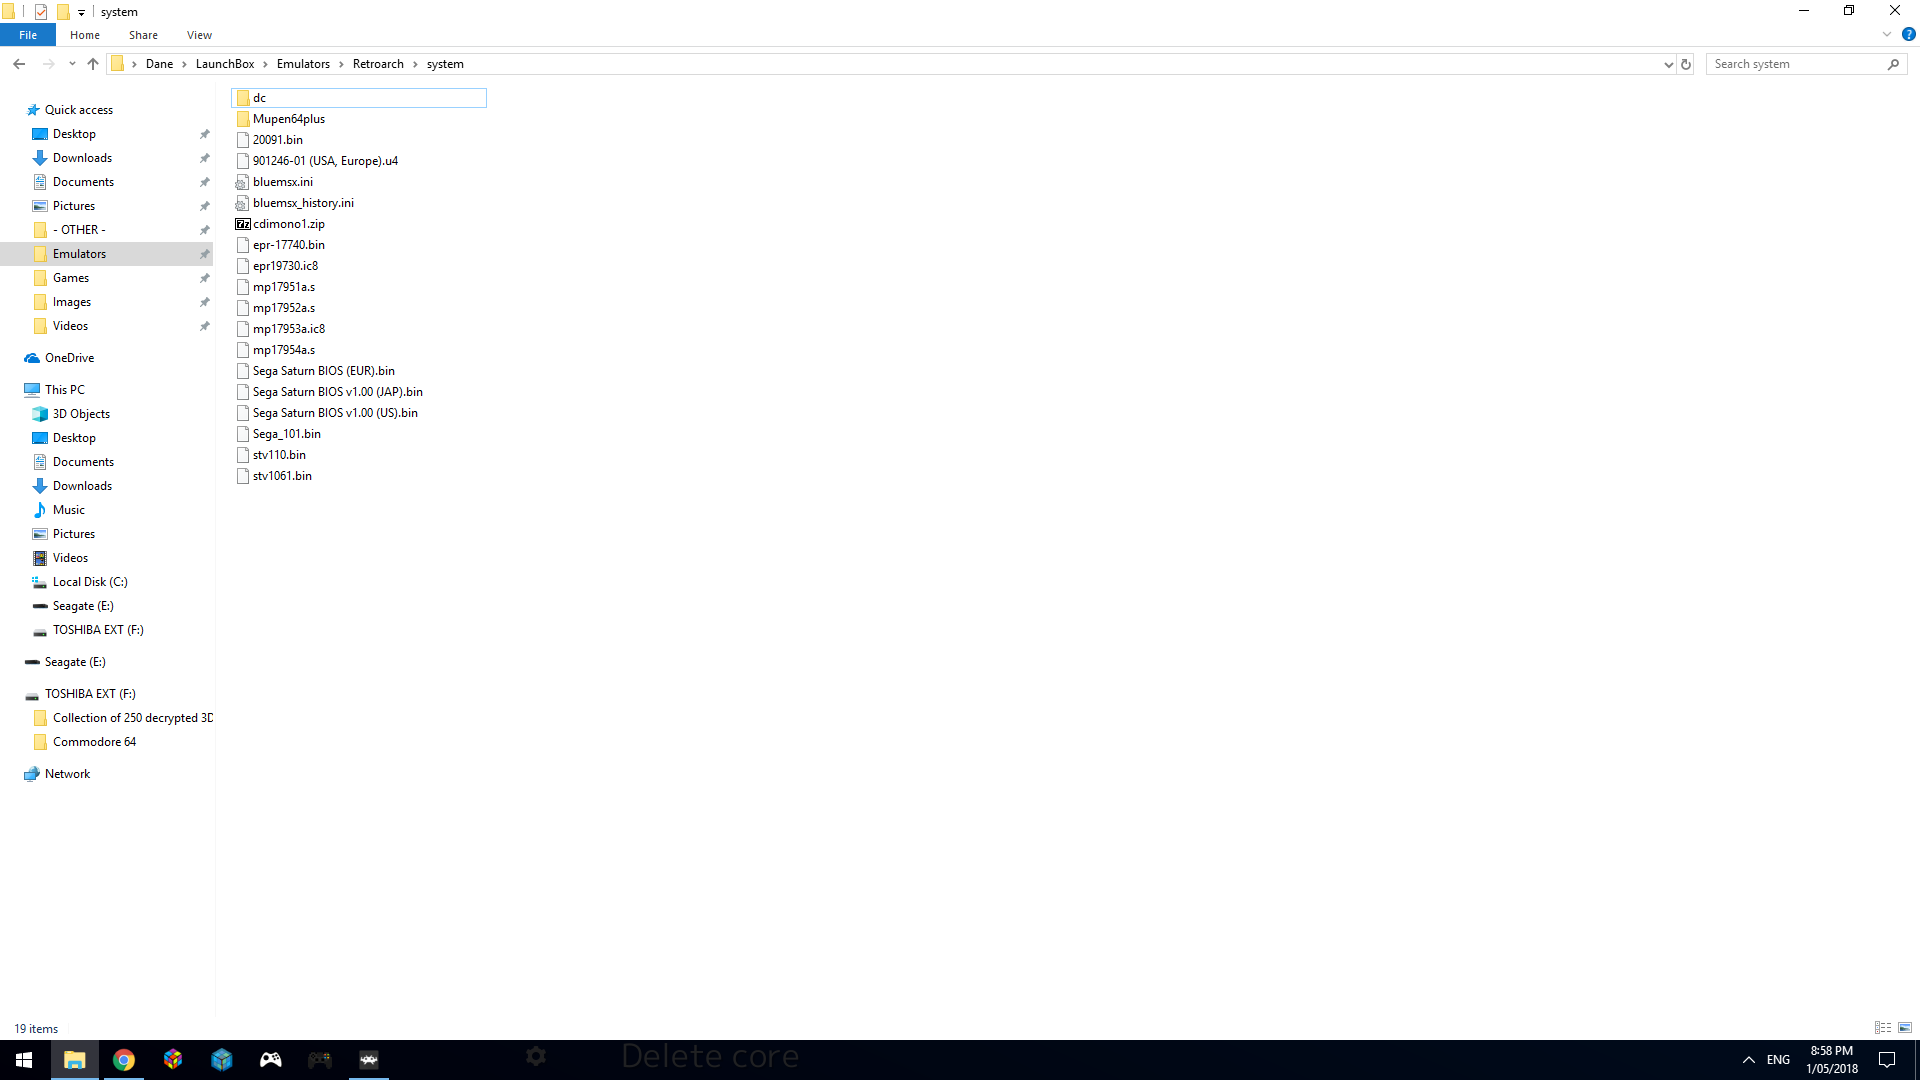 SEGA Saturn stuck on system settings menu in Mednafen